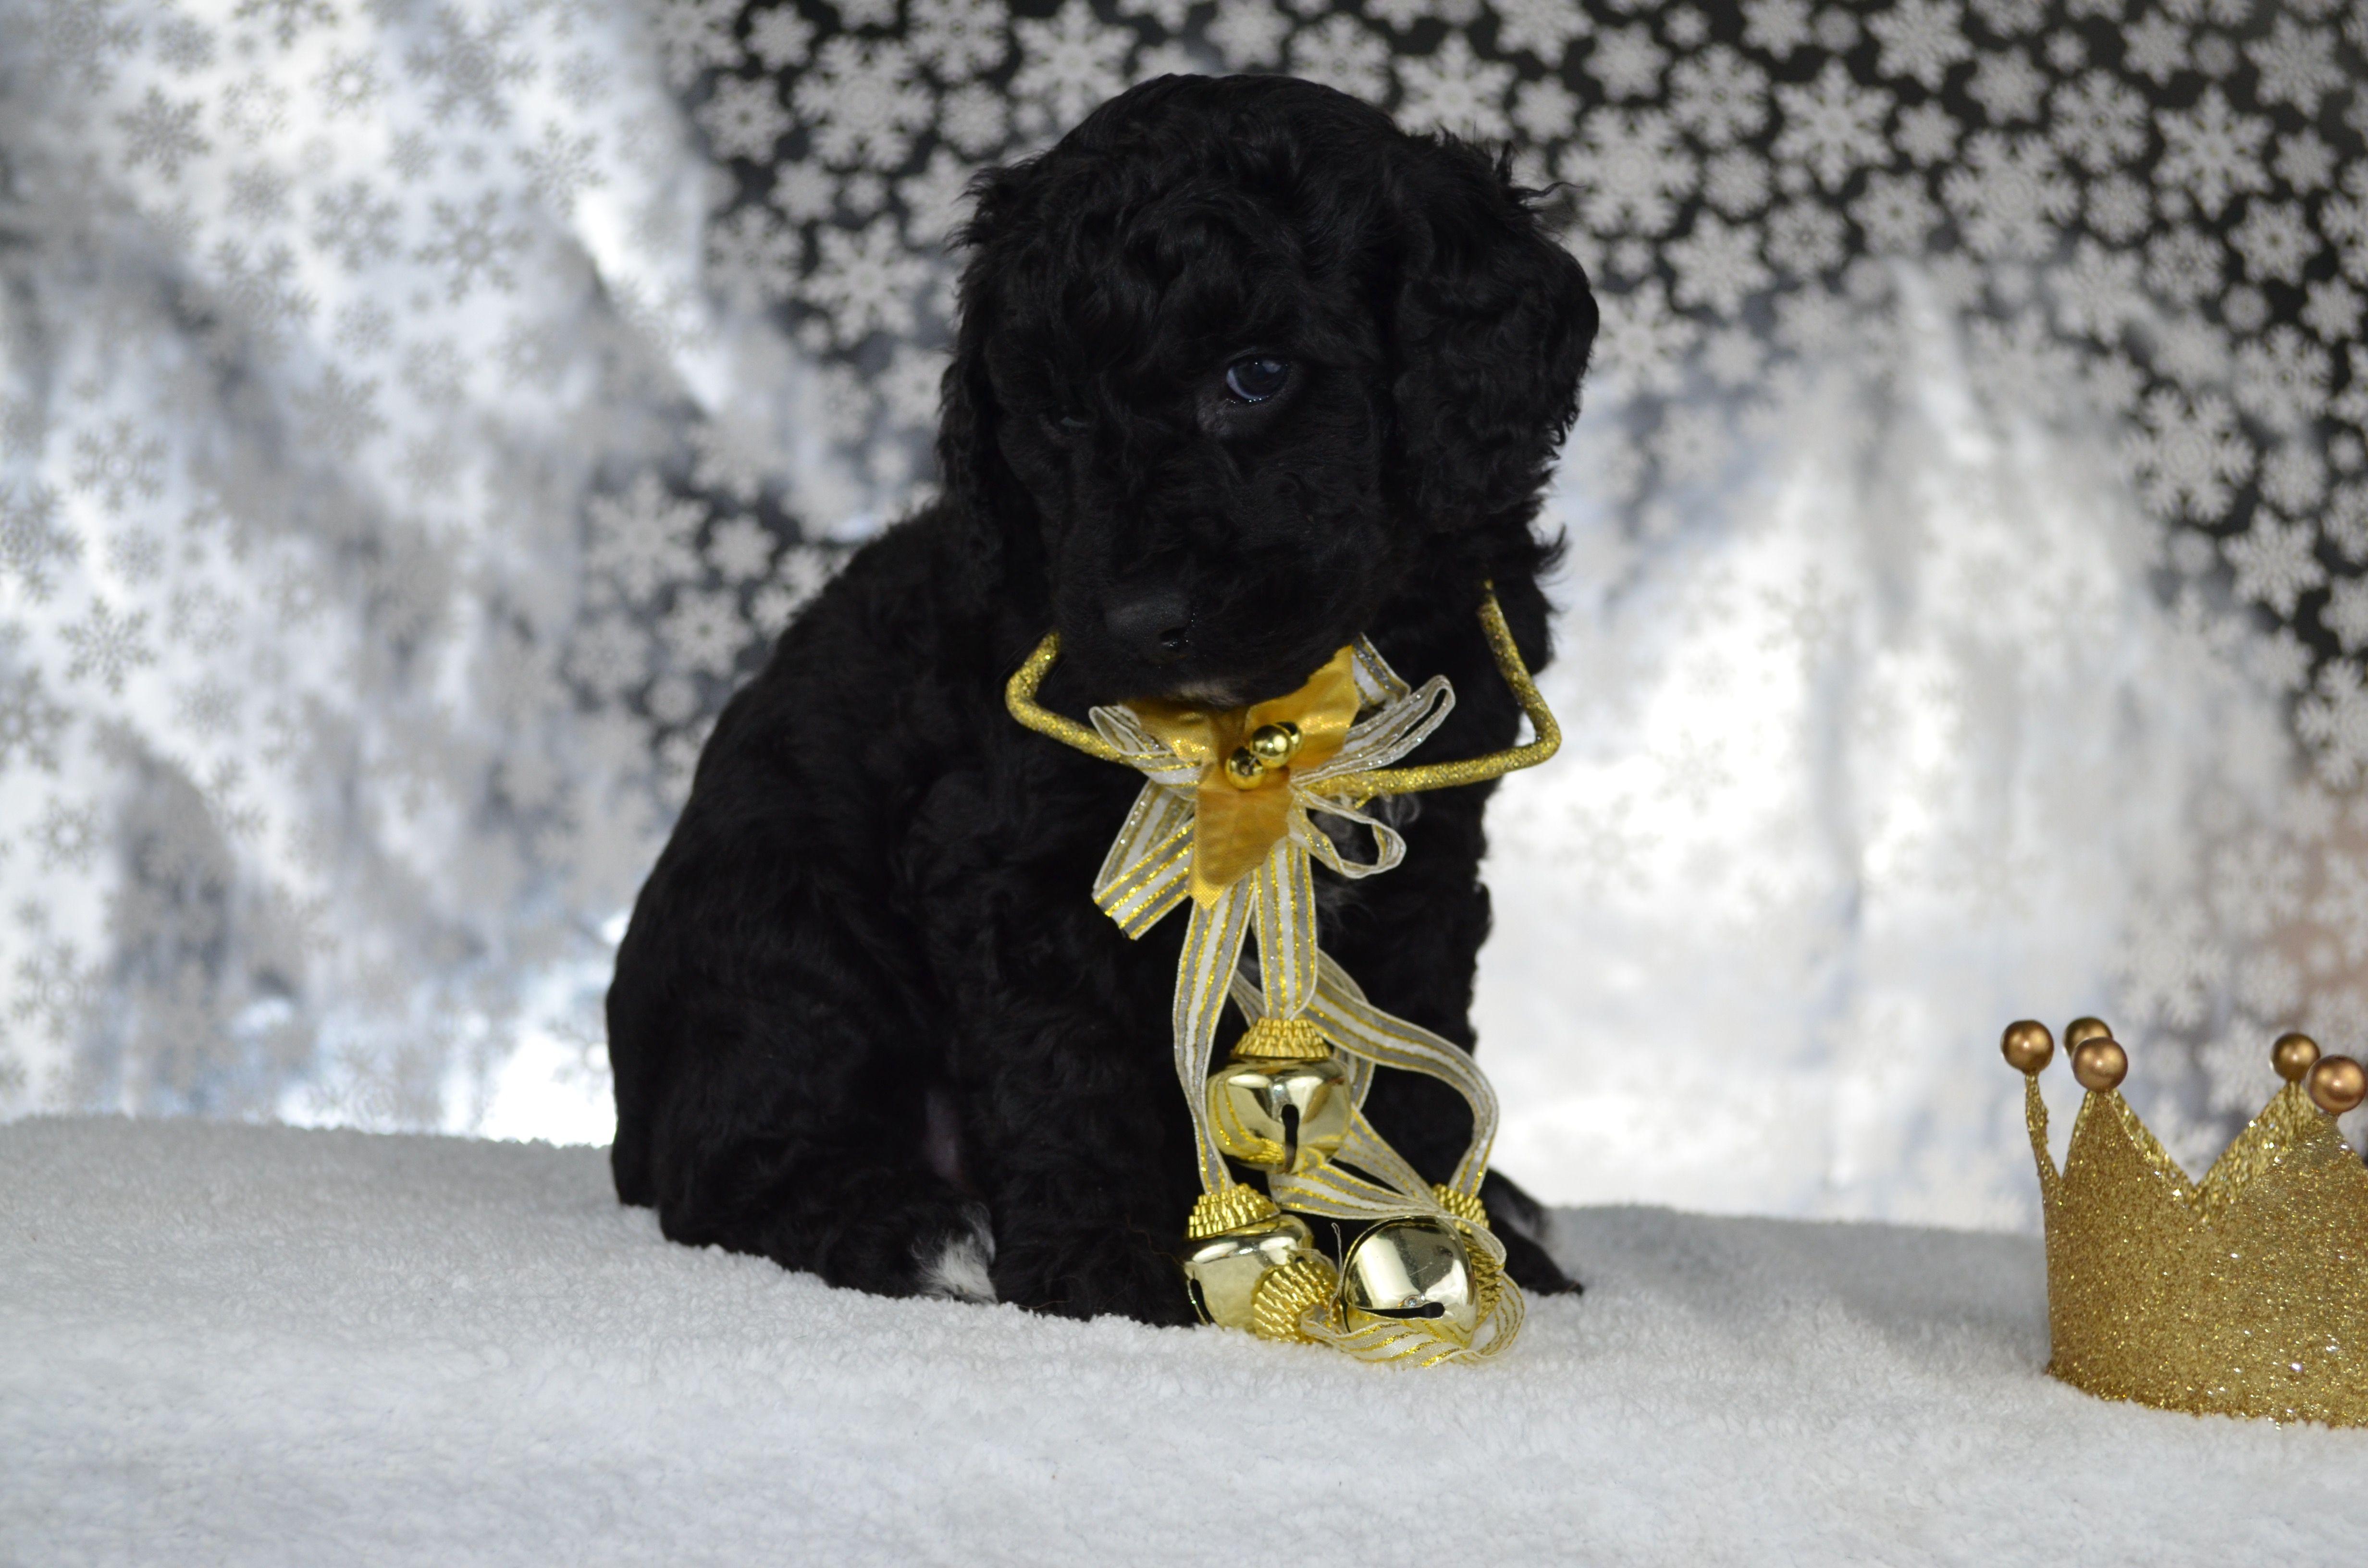 Adorable Mini Goldendoodle Puppies for sale Goldendoodle